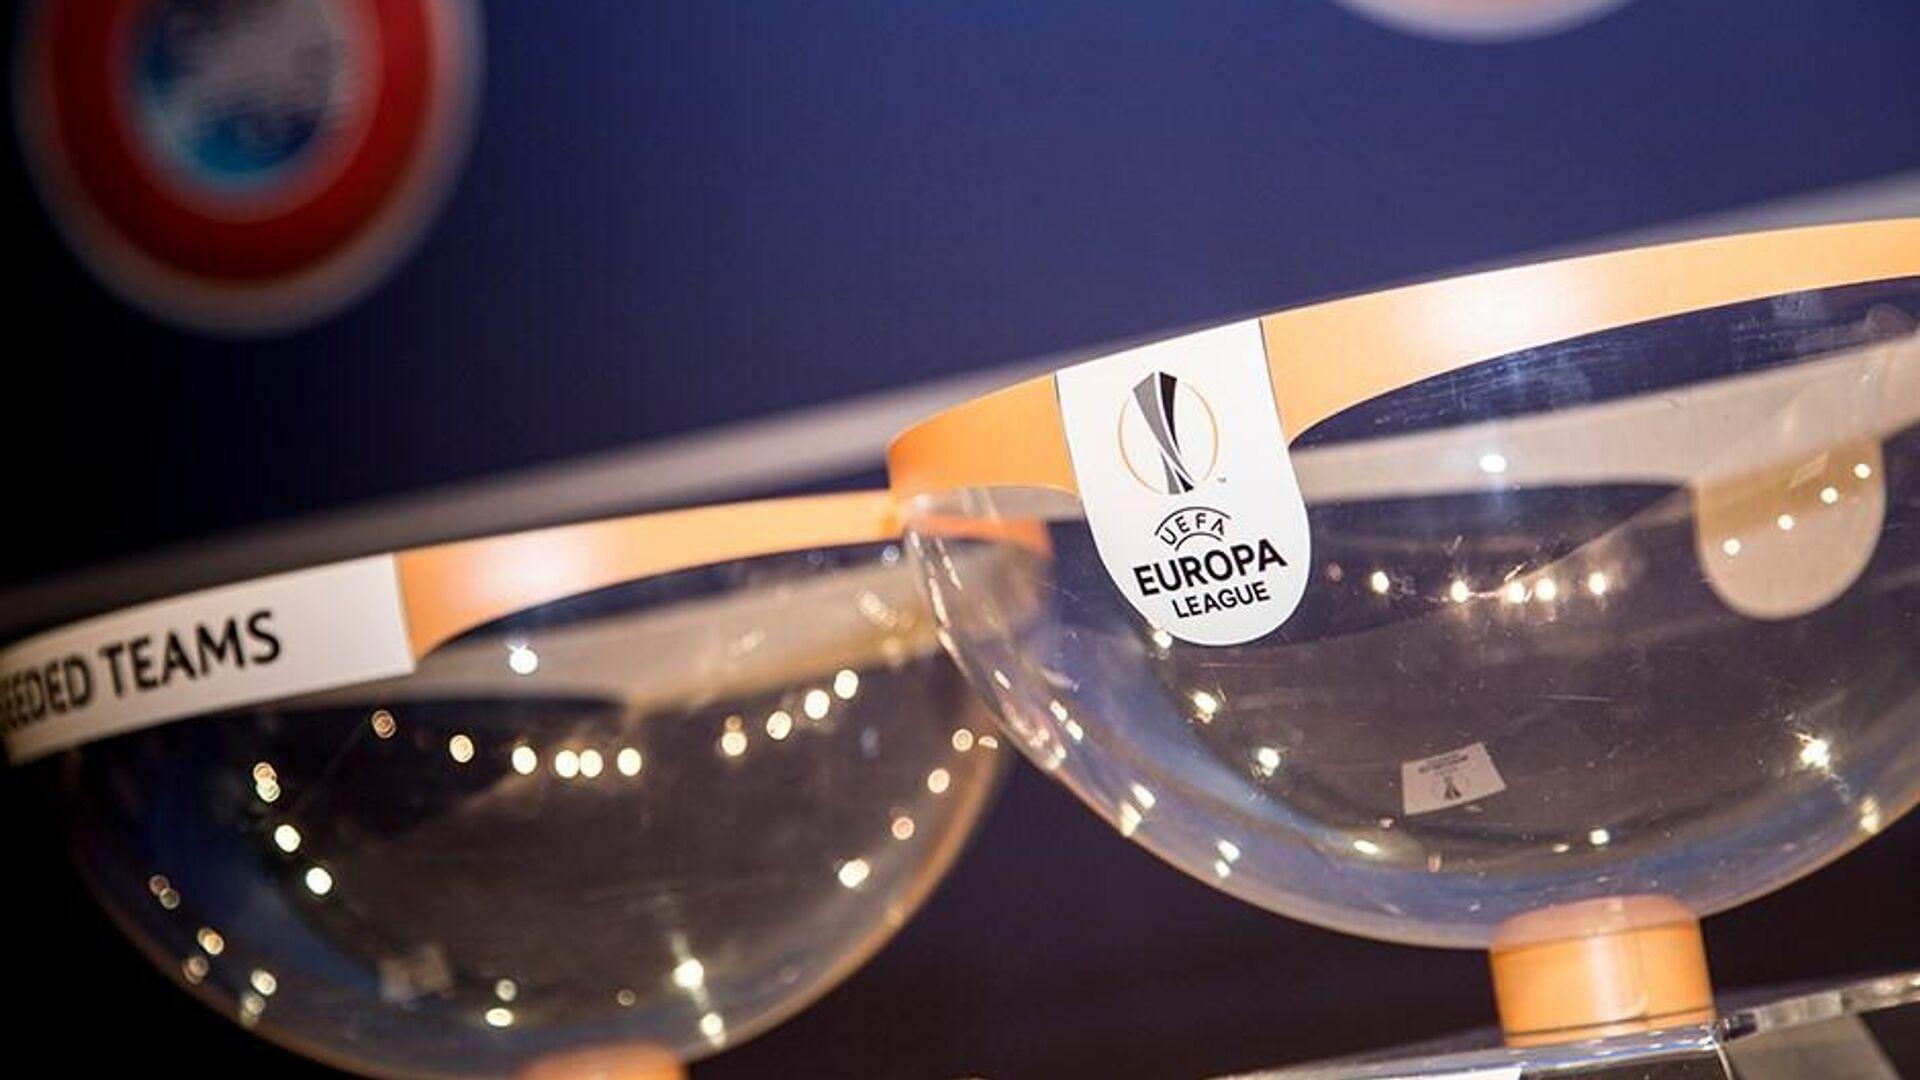 UEFA Avrupa Ligi - Sputnik Türkiye, 1920, 28.08.2021